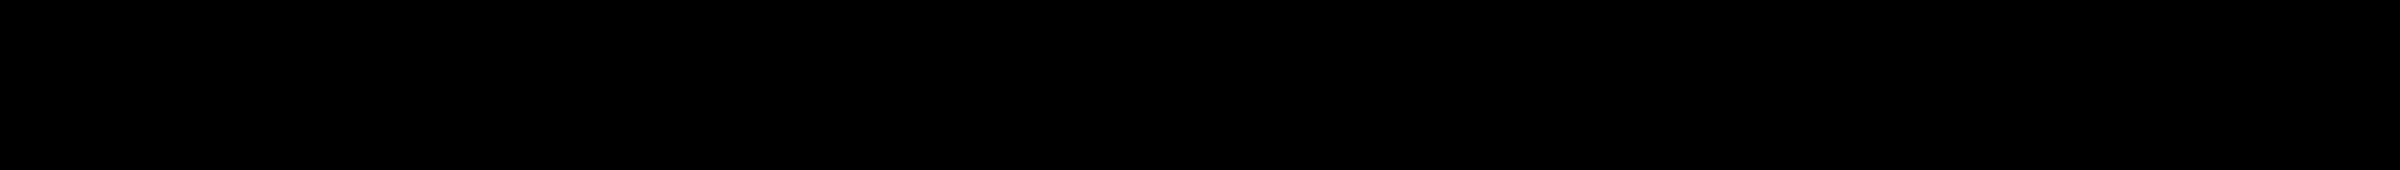 up-divider-2400px.png